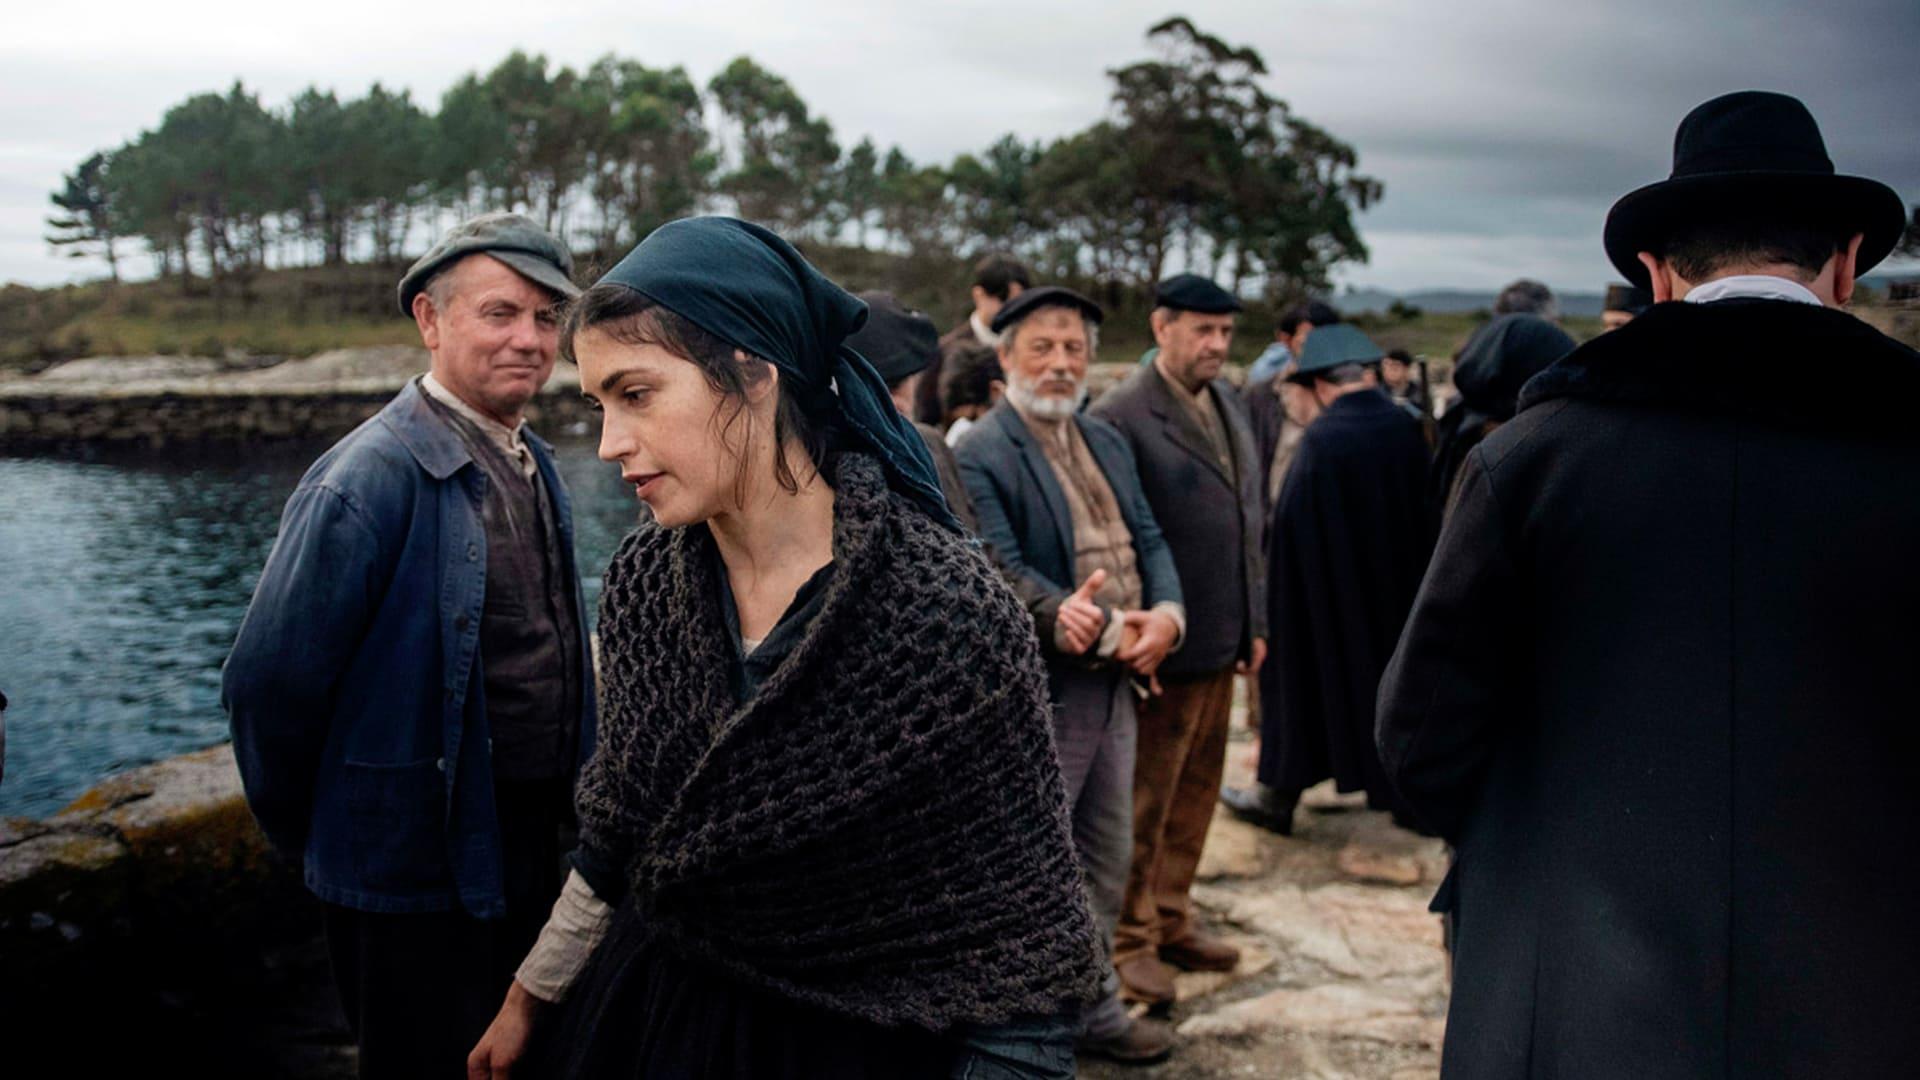 The Island of Lies [La isla de las mentiras] — Moro Spanish Film Festival 2021